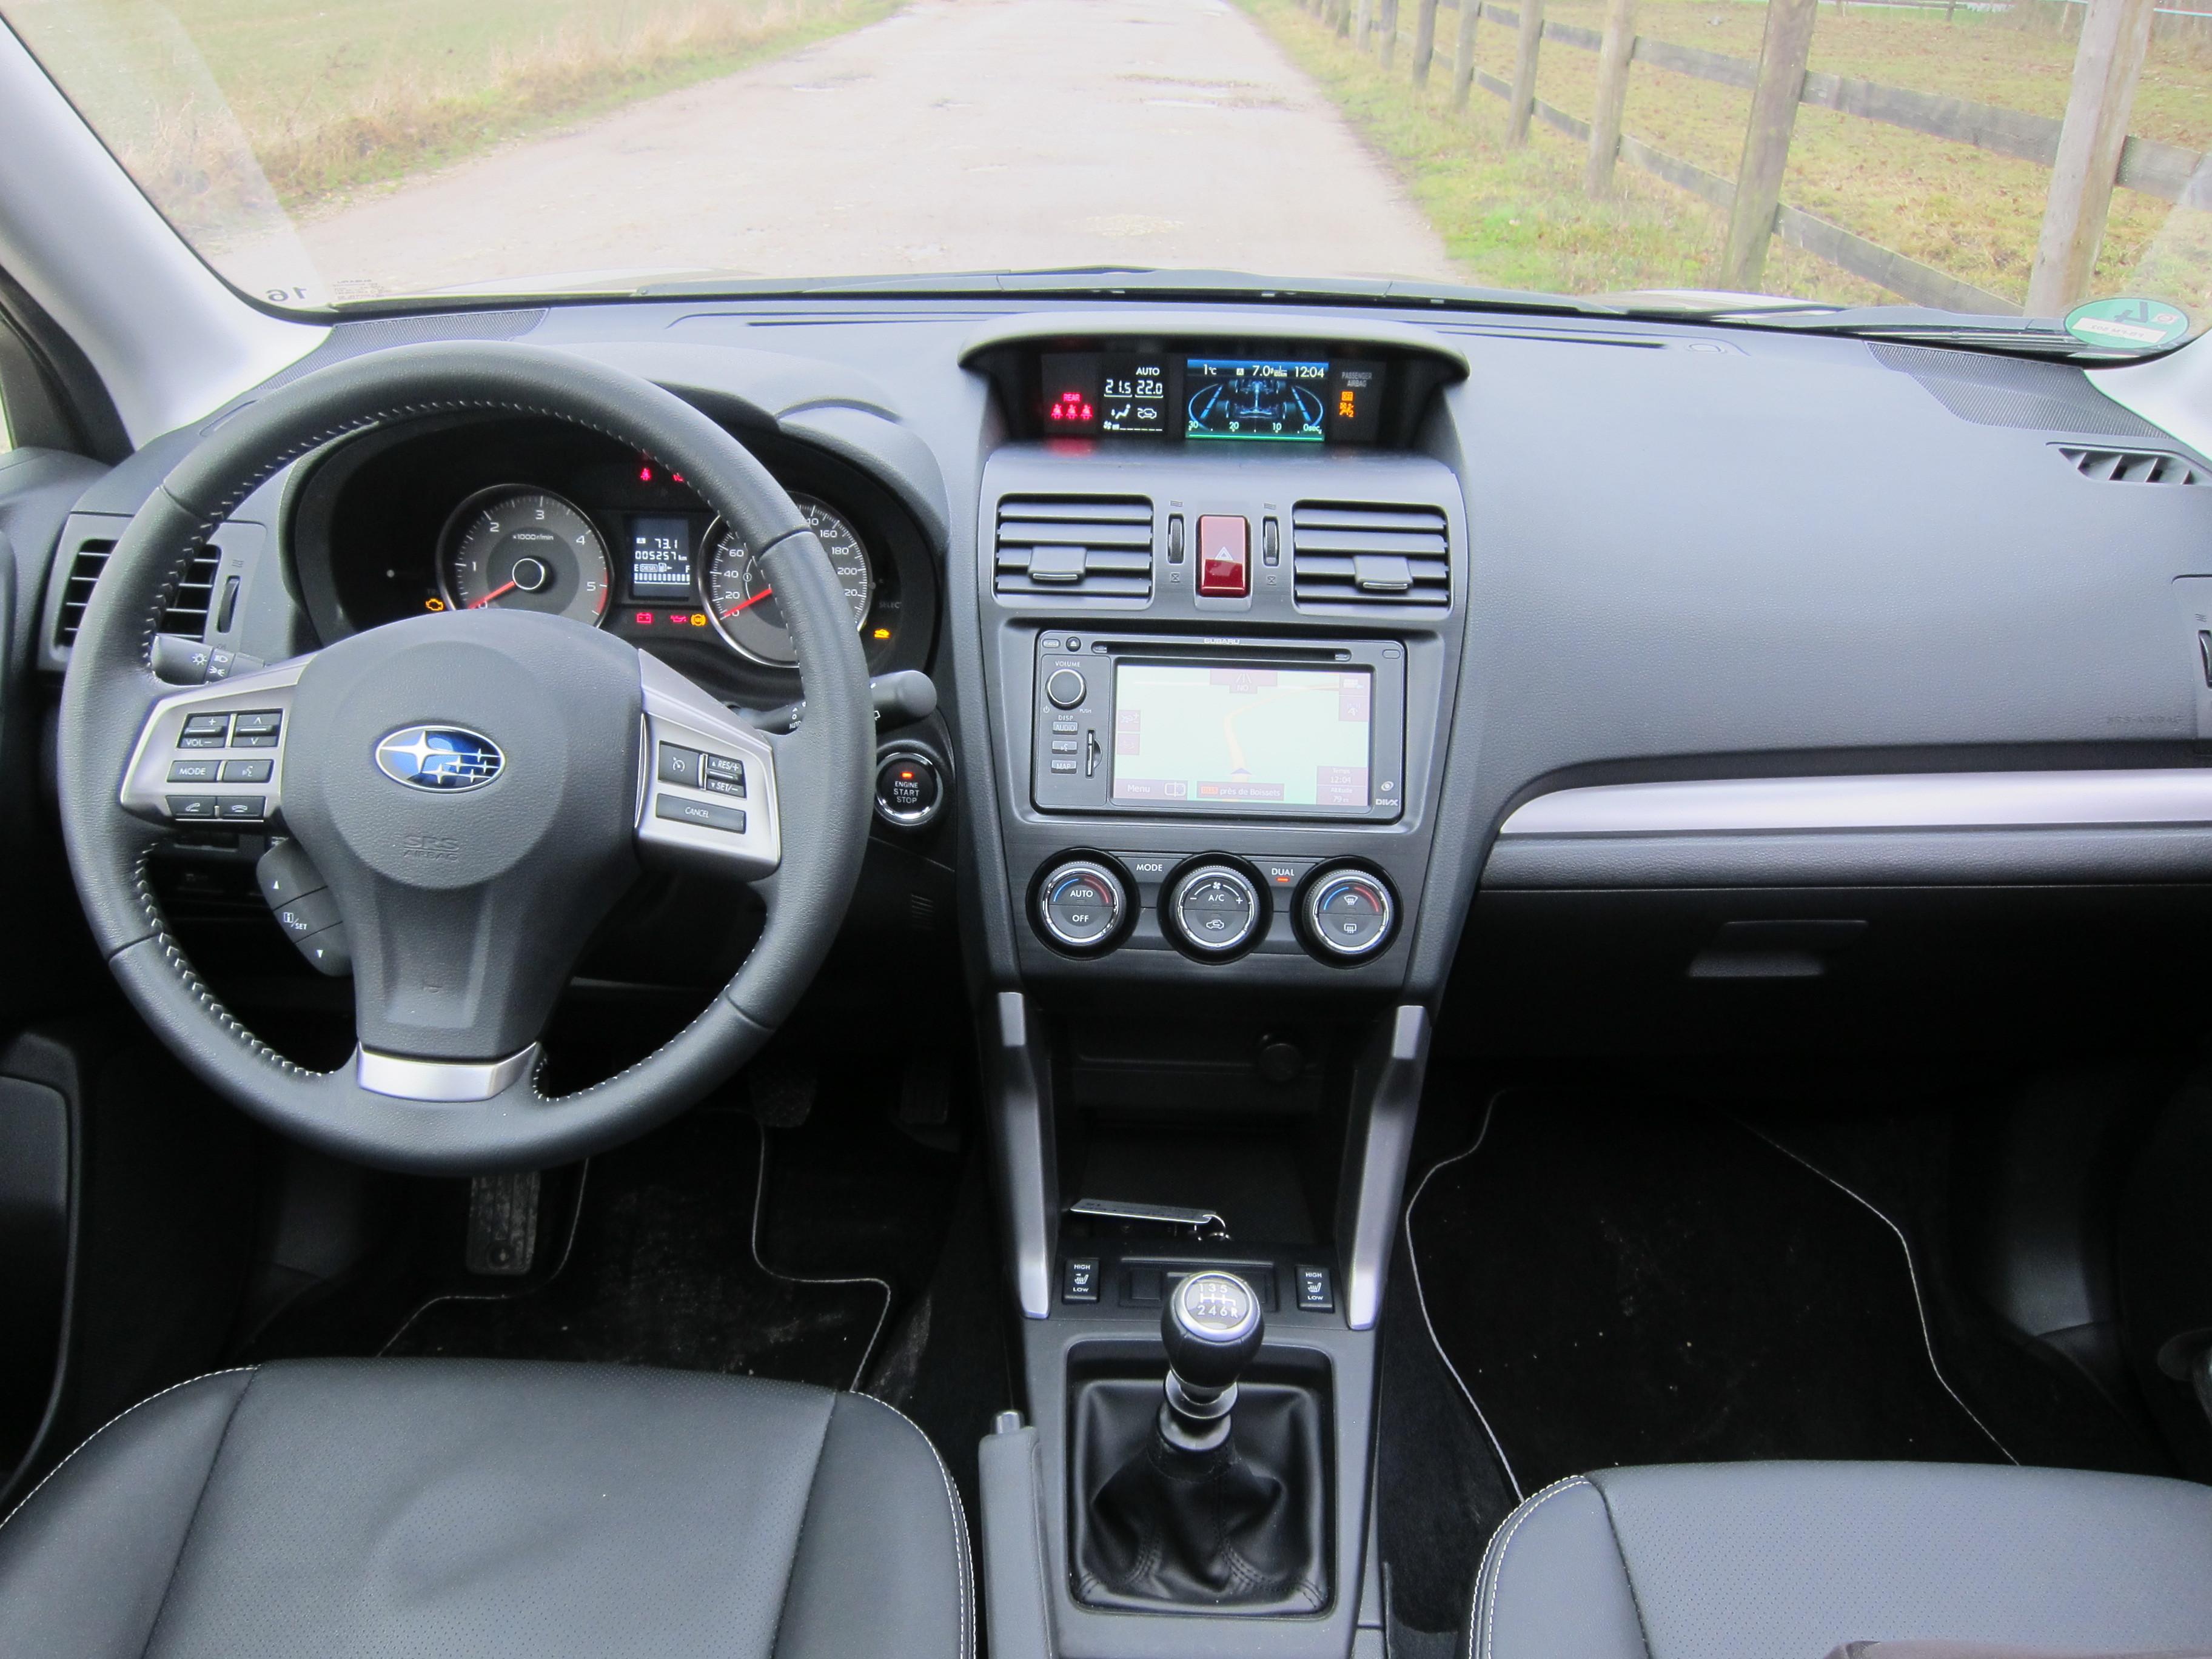 Essai vid o subaru forester iv le plus grand suv compact for Subaru interieur